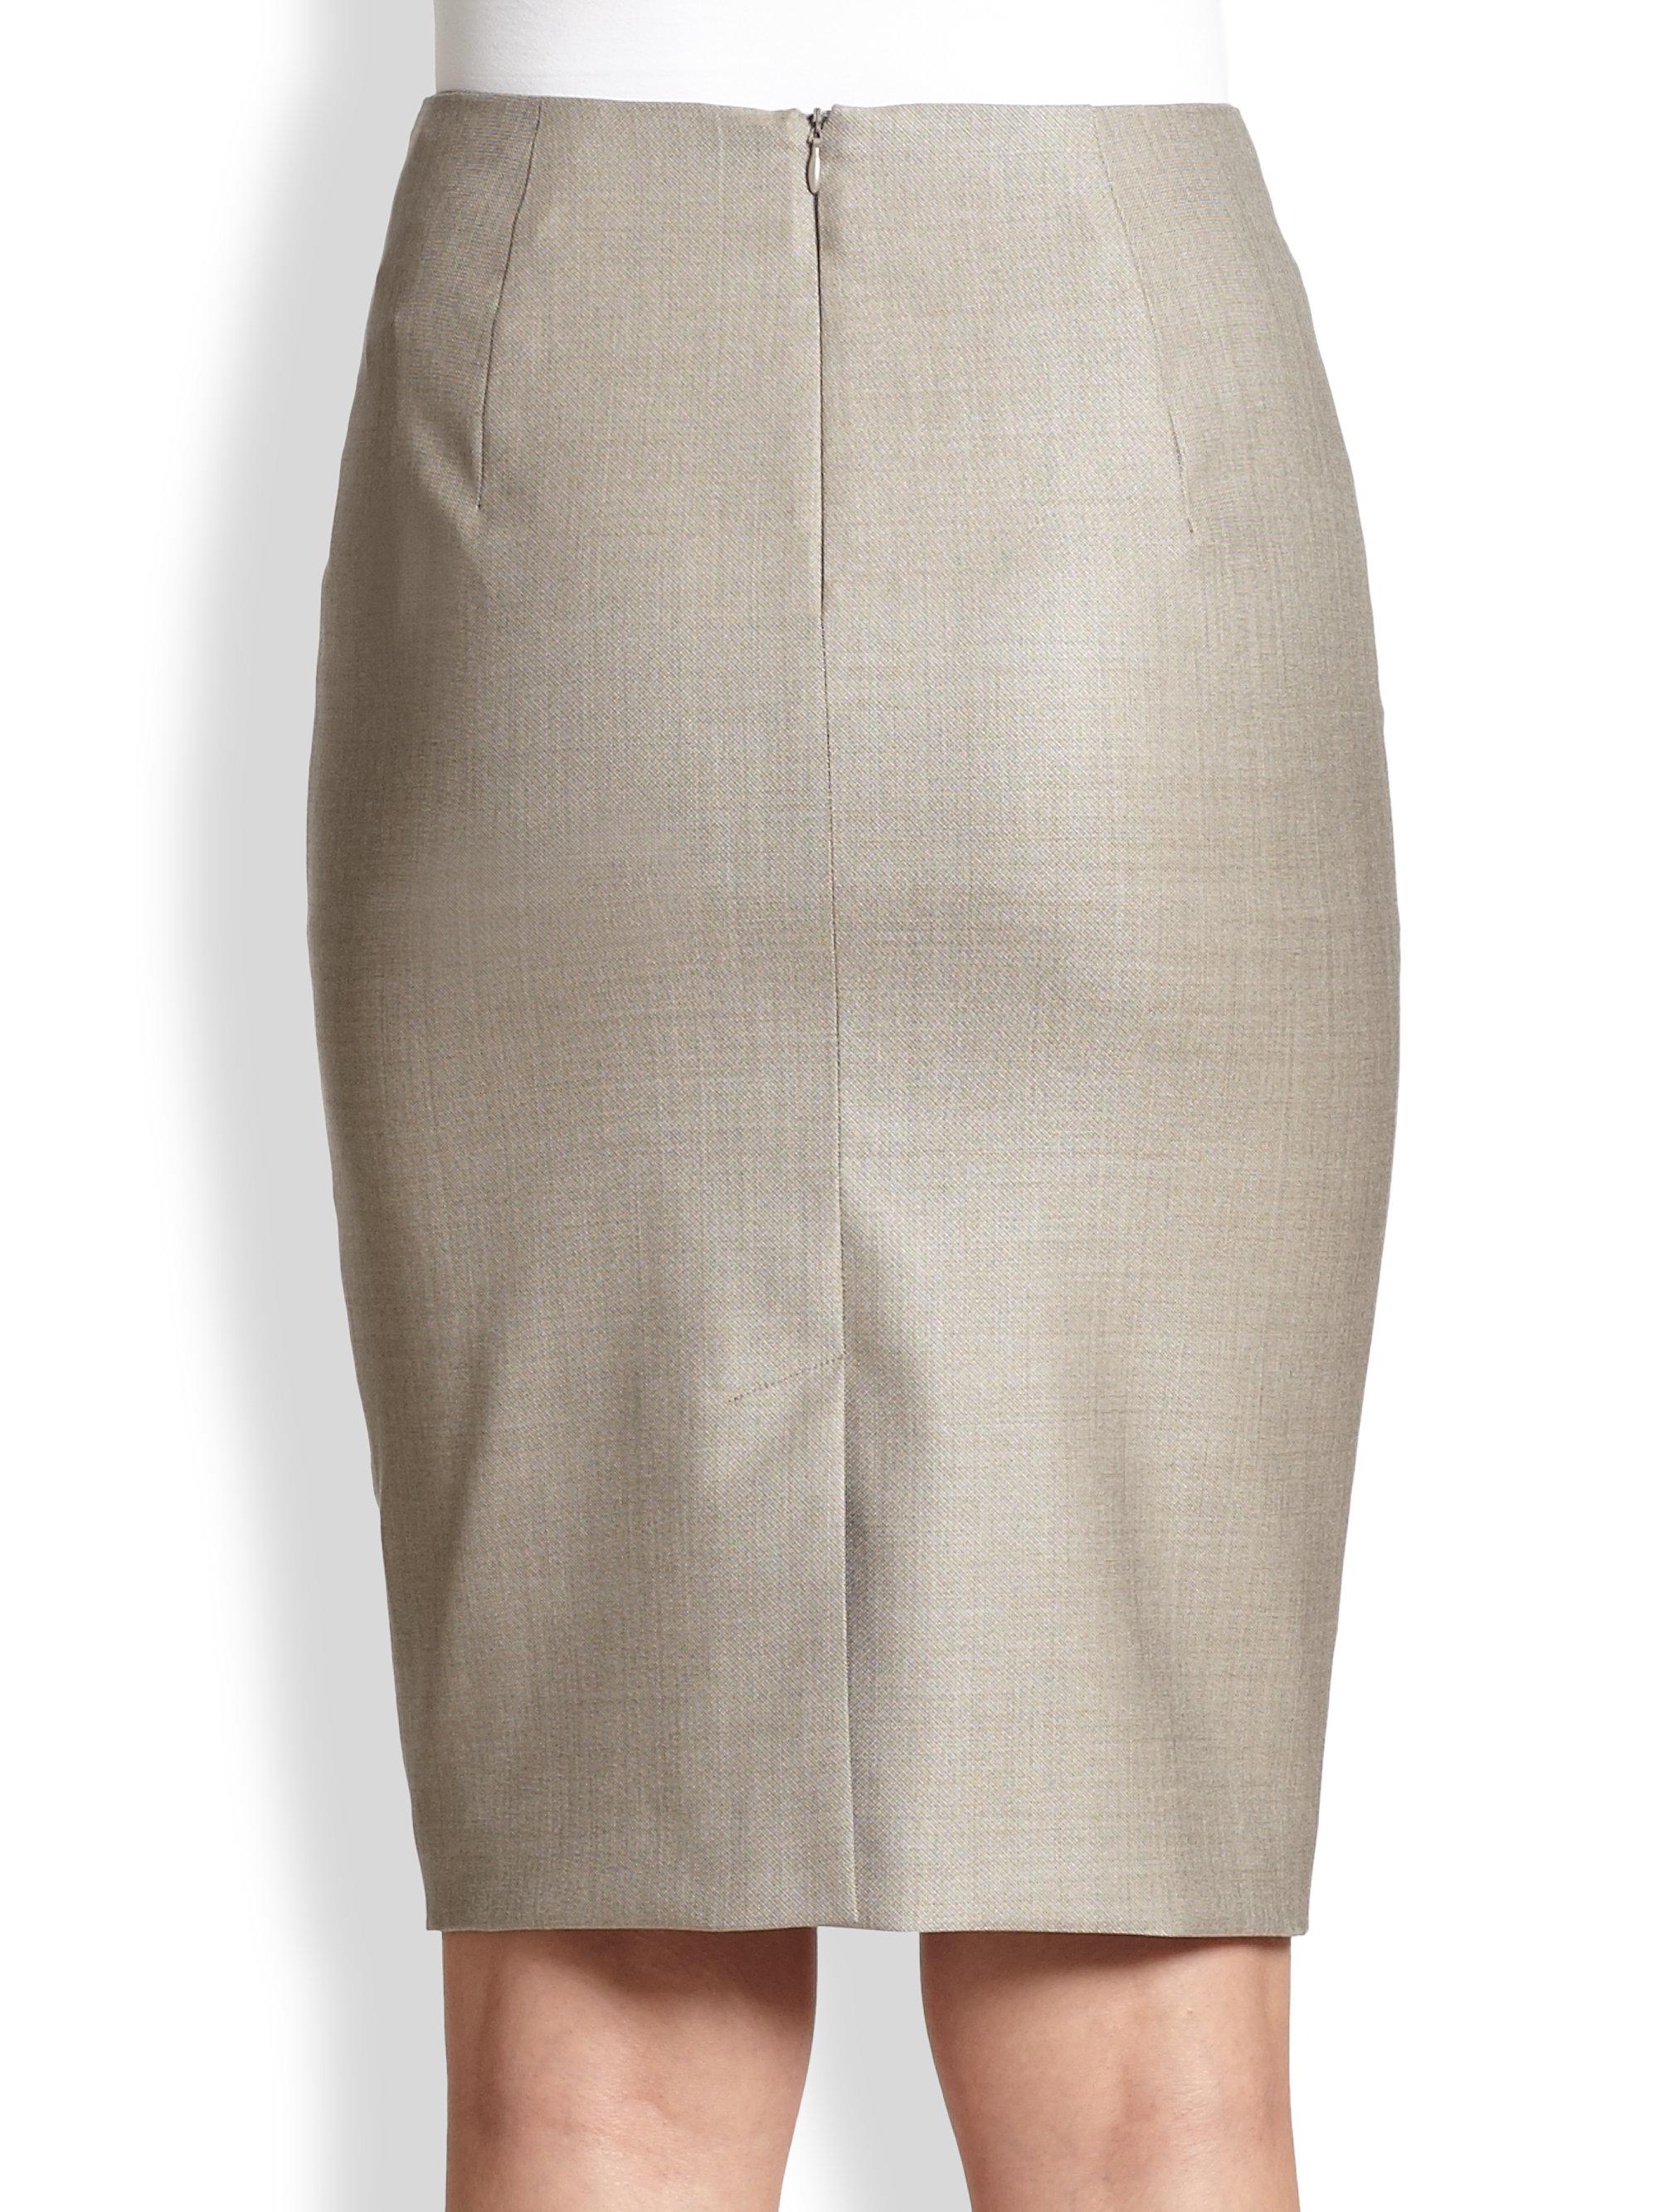 Max mara Hidesia Wool Silk Pencil Skirt in Gray | Lyst